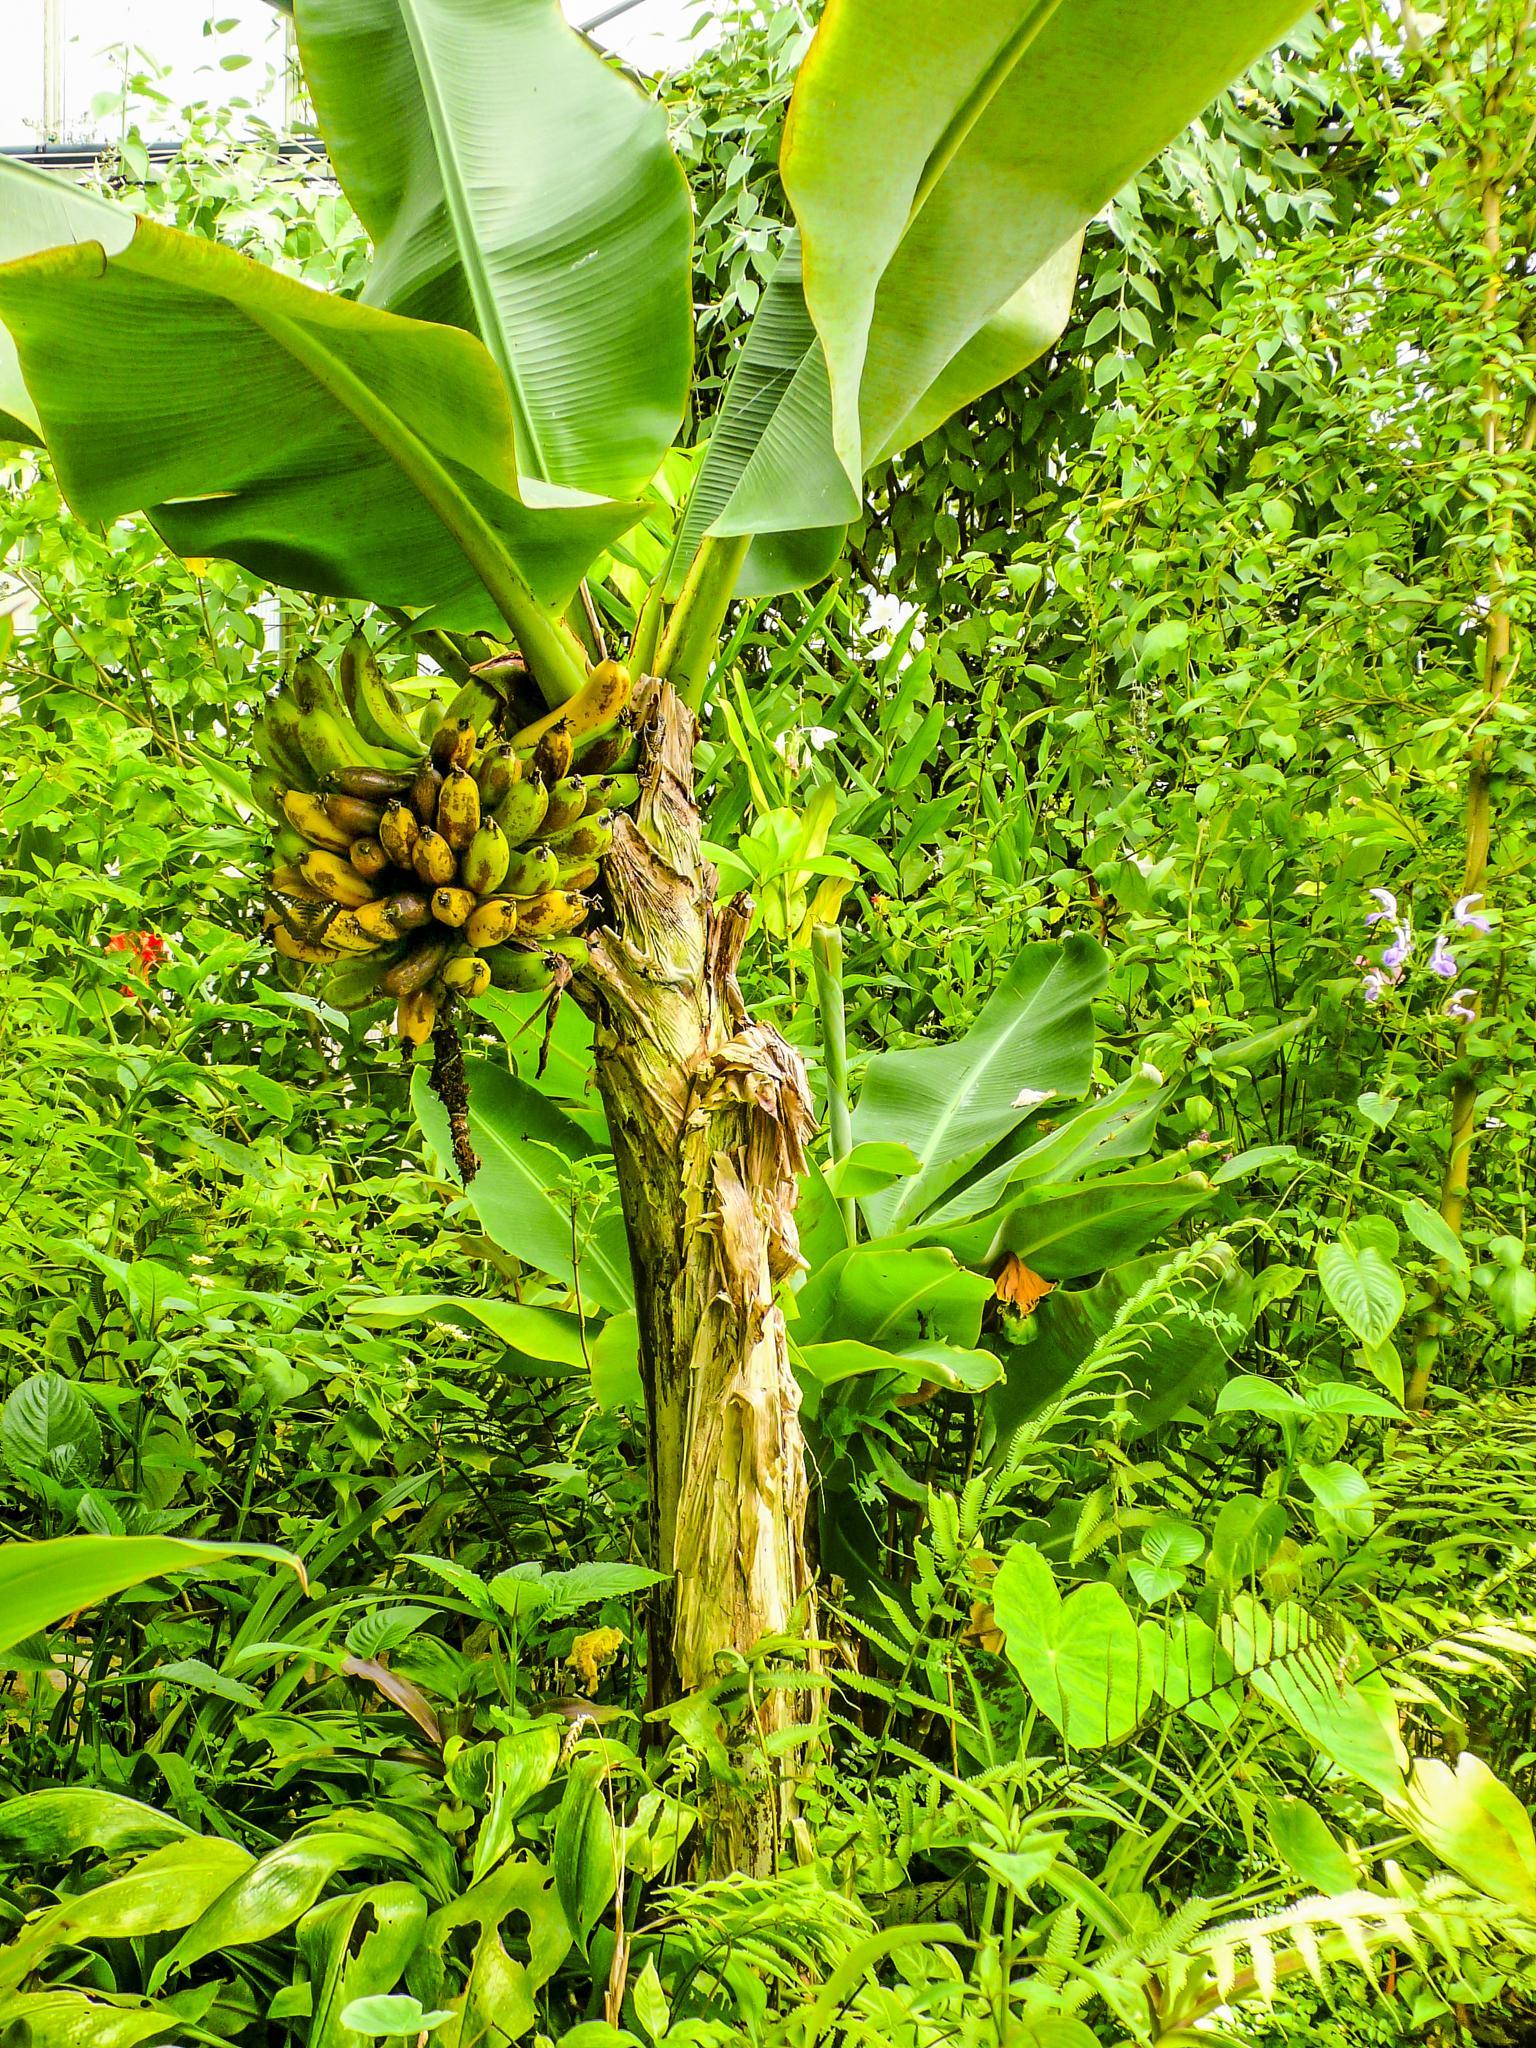 Banana tree with ripe bananas by JanetFernandes